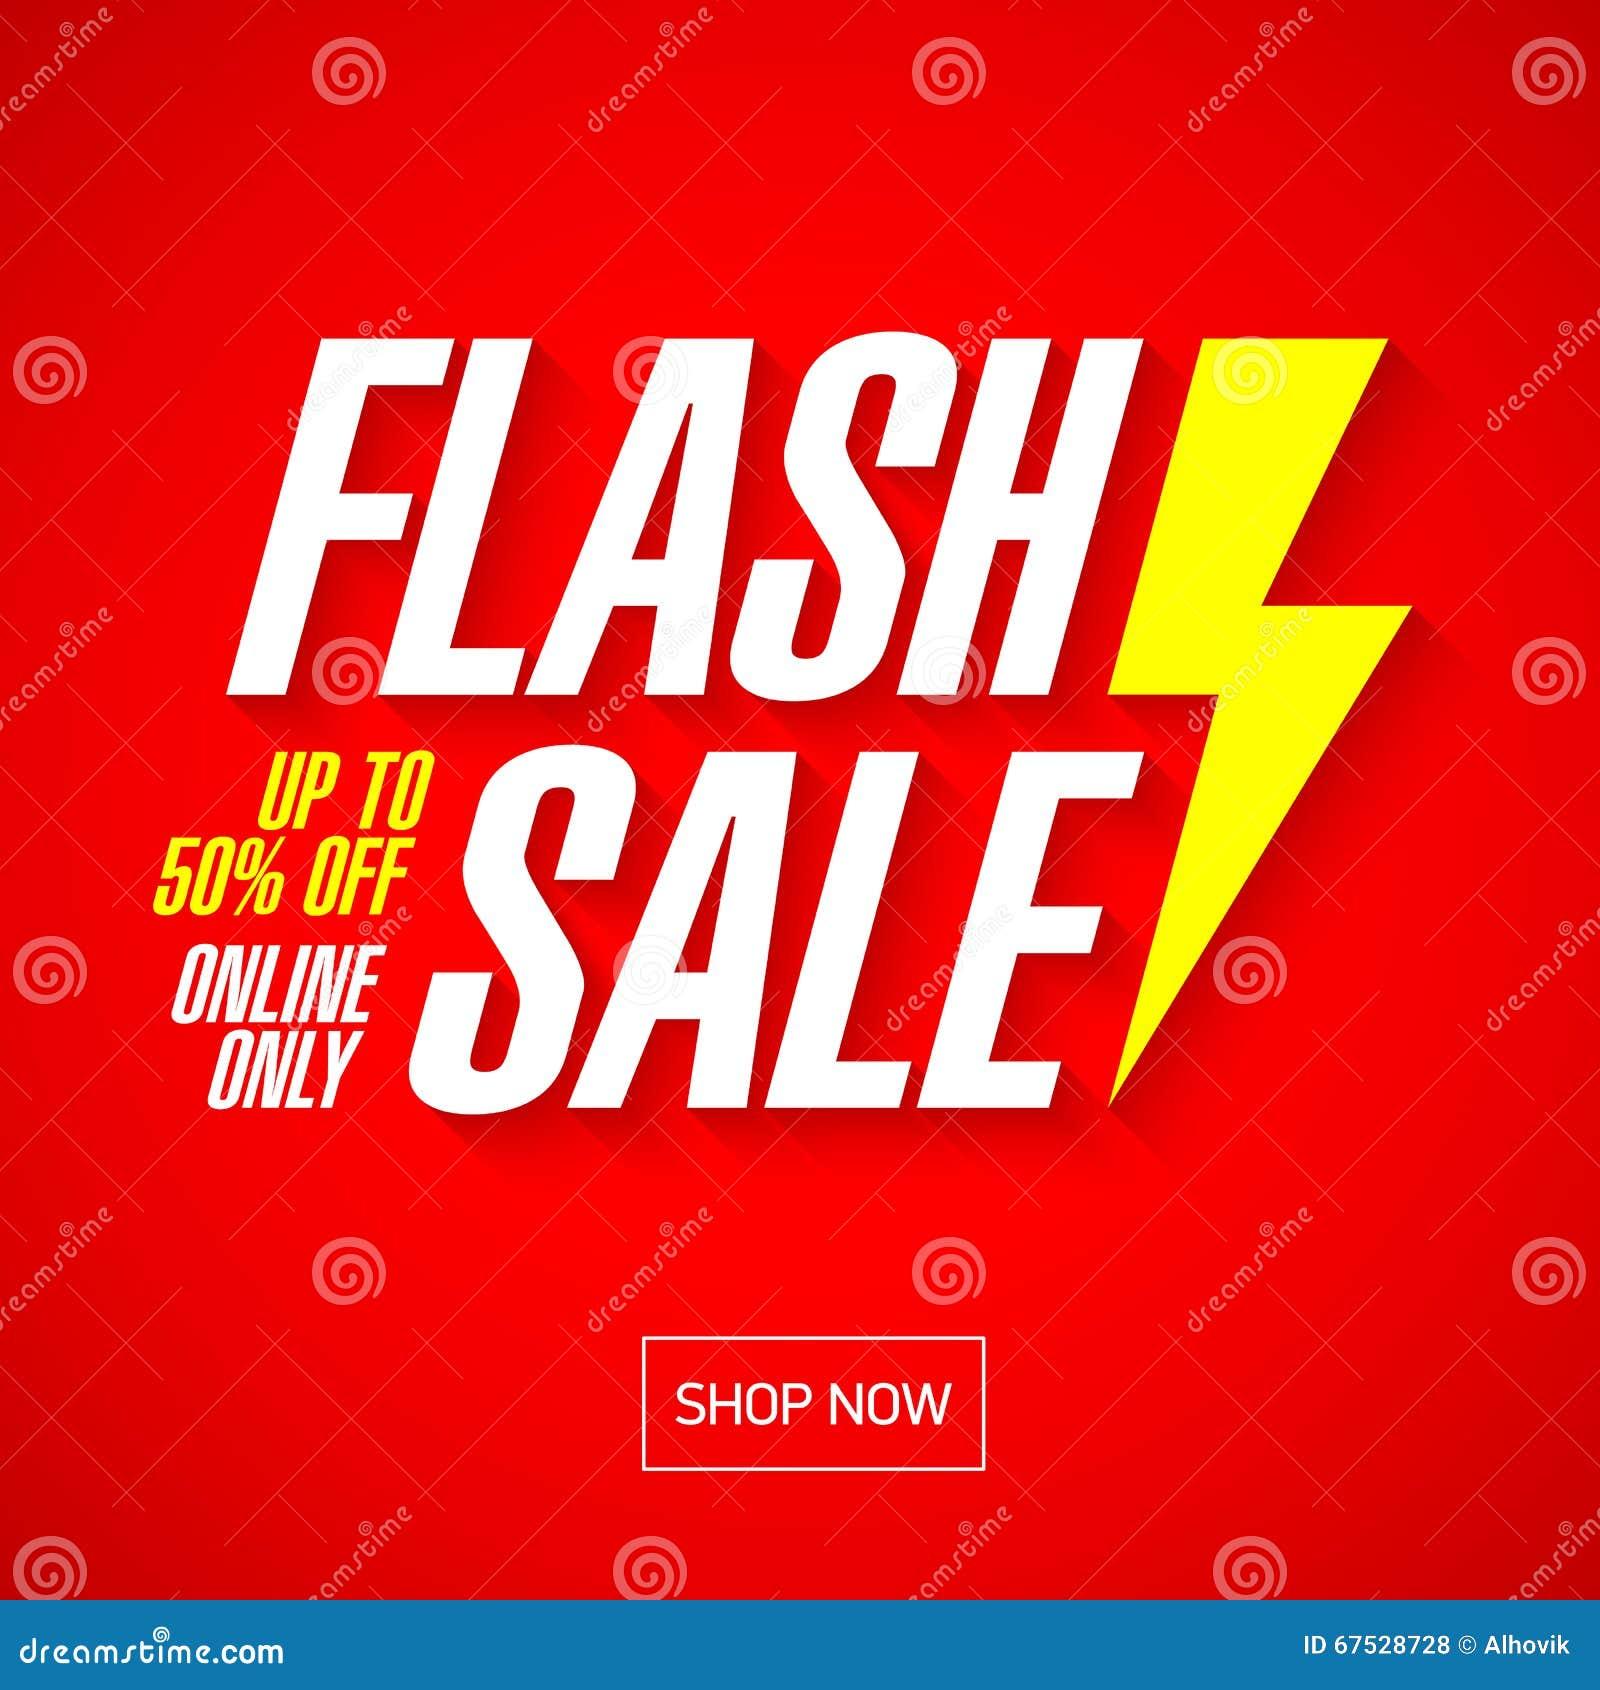 big w flash sale - photo #30